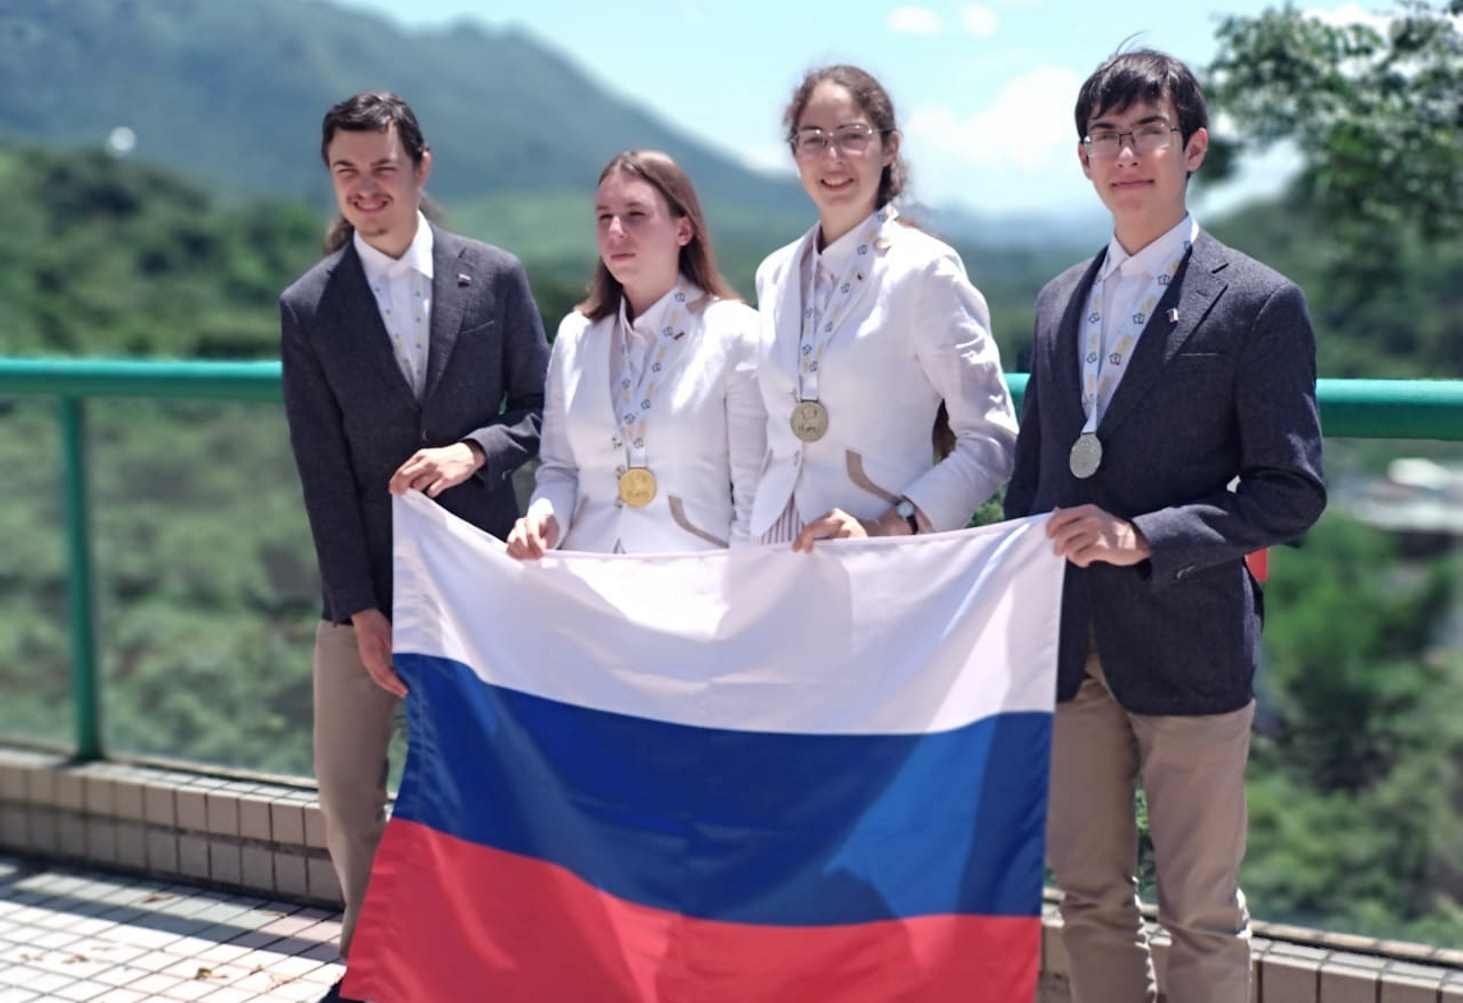 rossijskie-shkolniki-zavoevali-tri-medali-na-mezhdunarodnoj-geograficheskoj-olimpiade